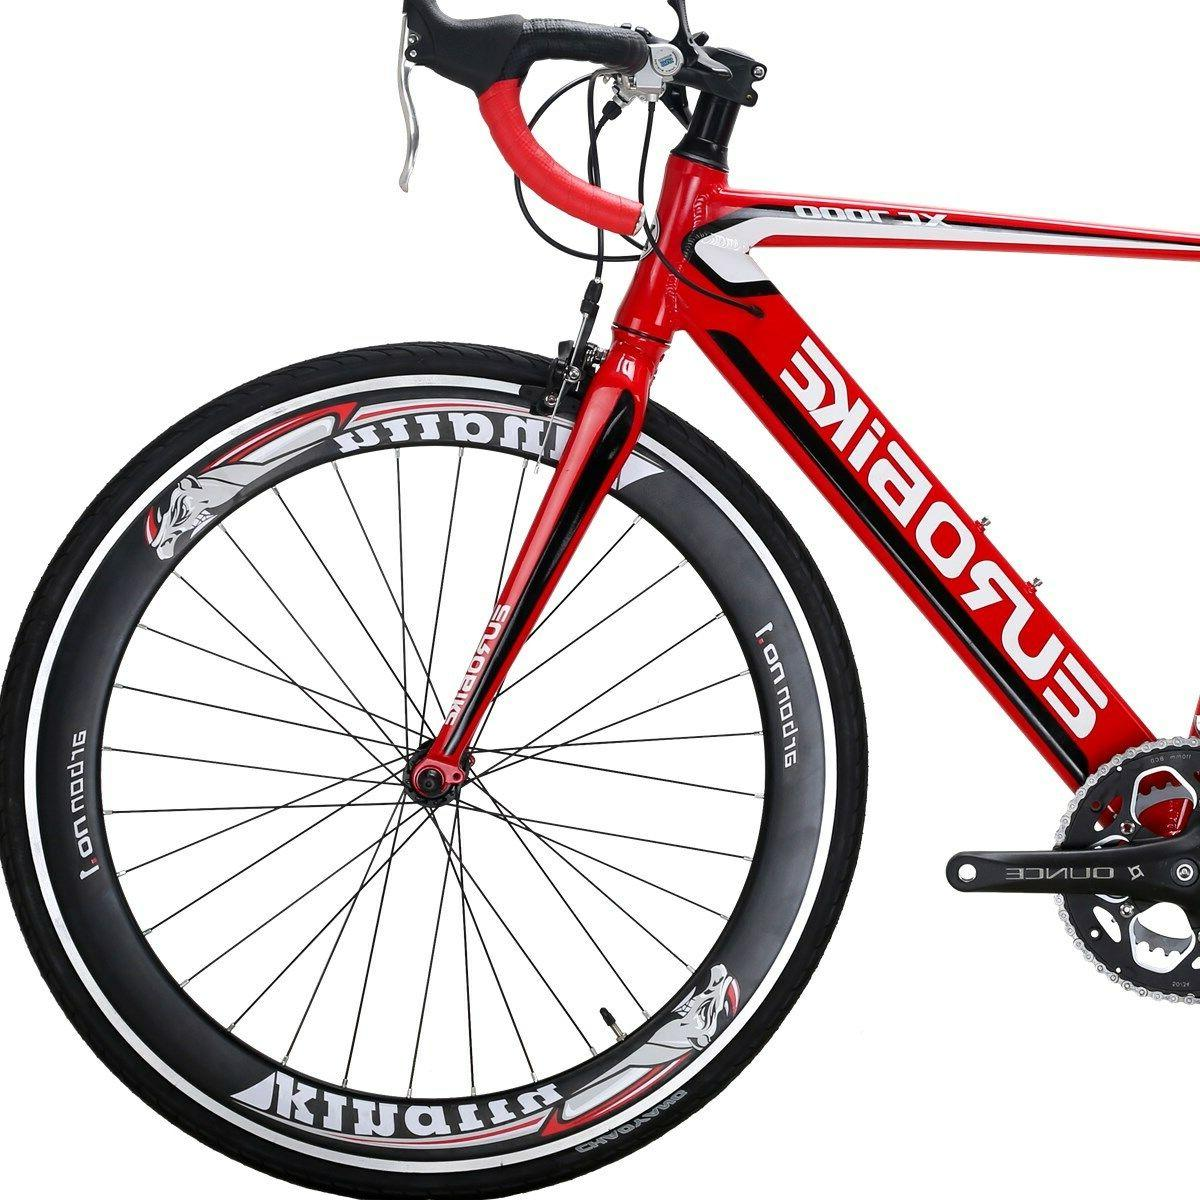 Road bike Frame 14 Complete bicycle 54CM